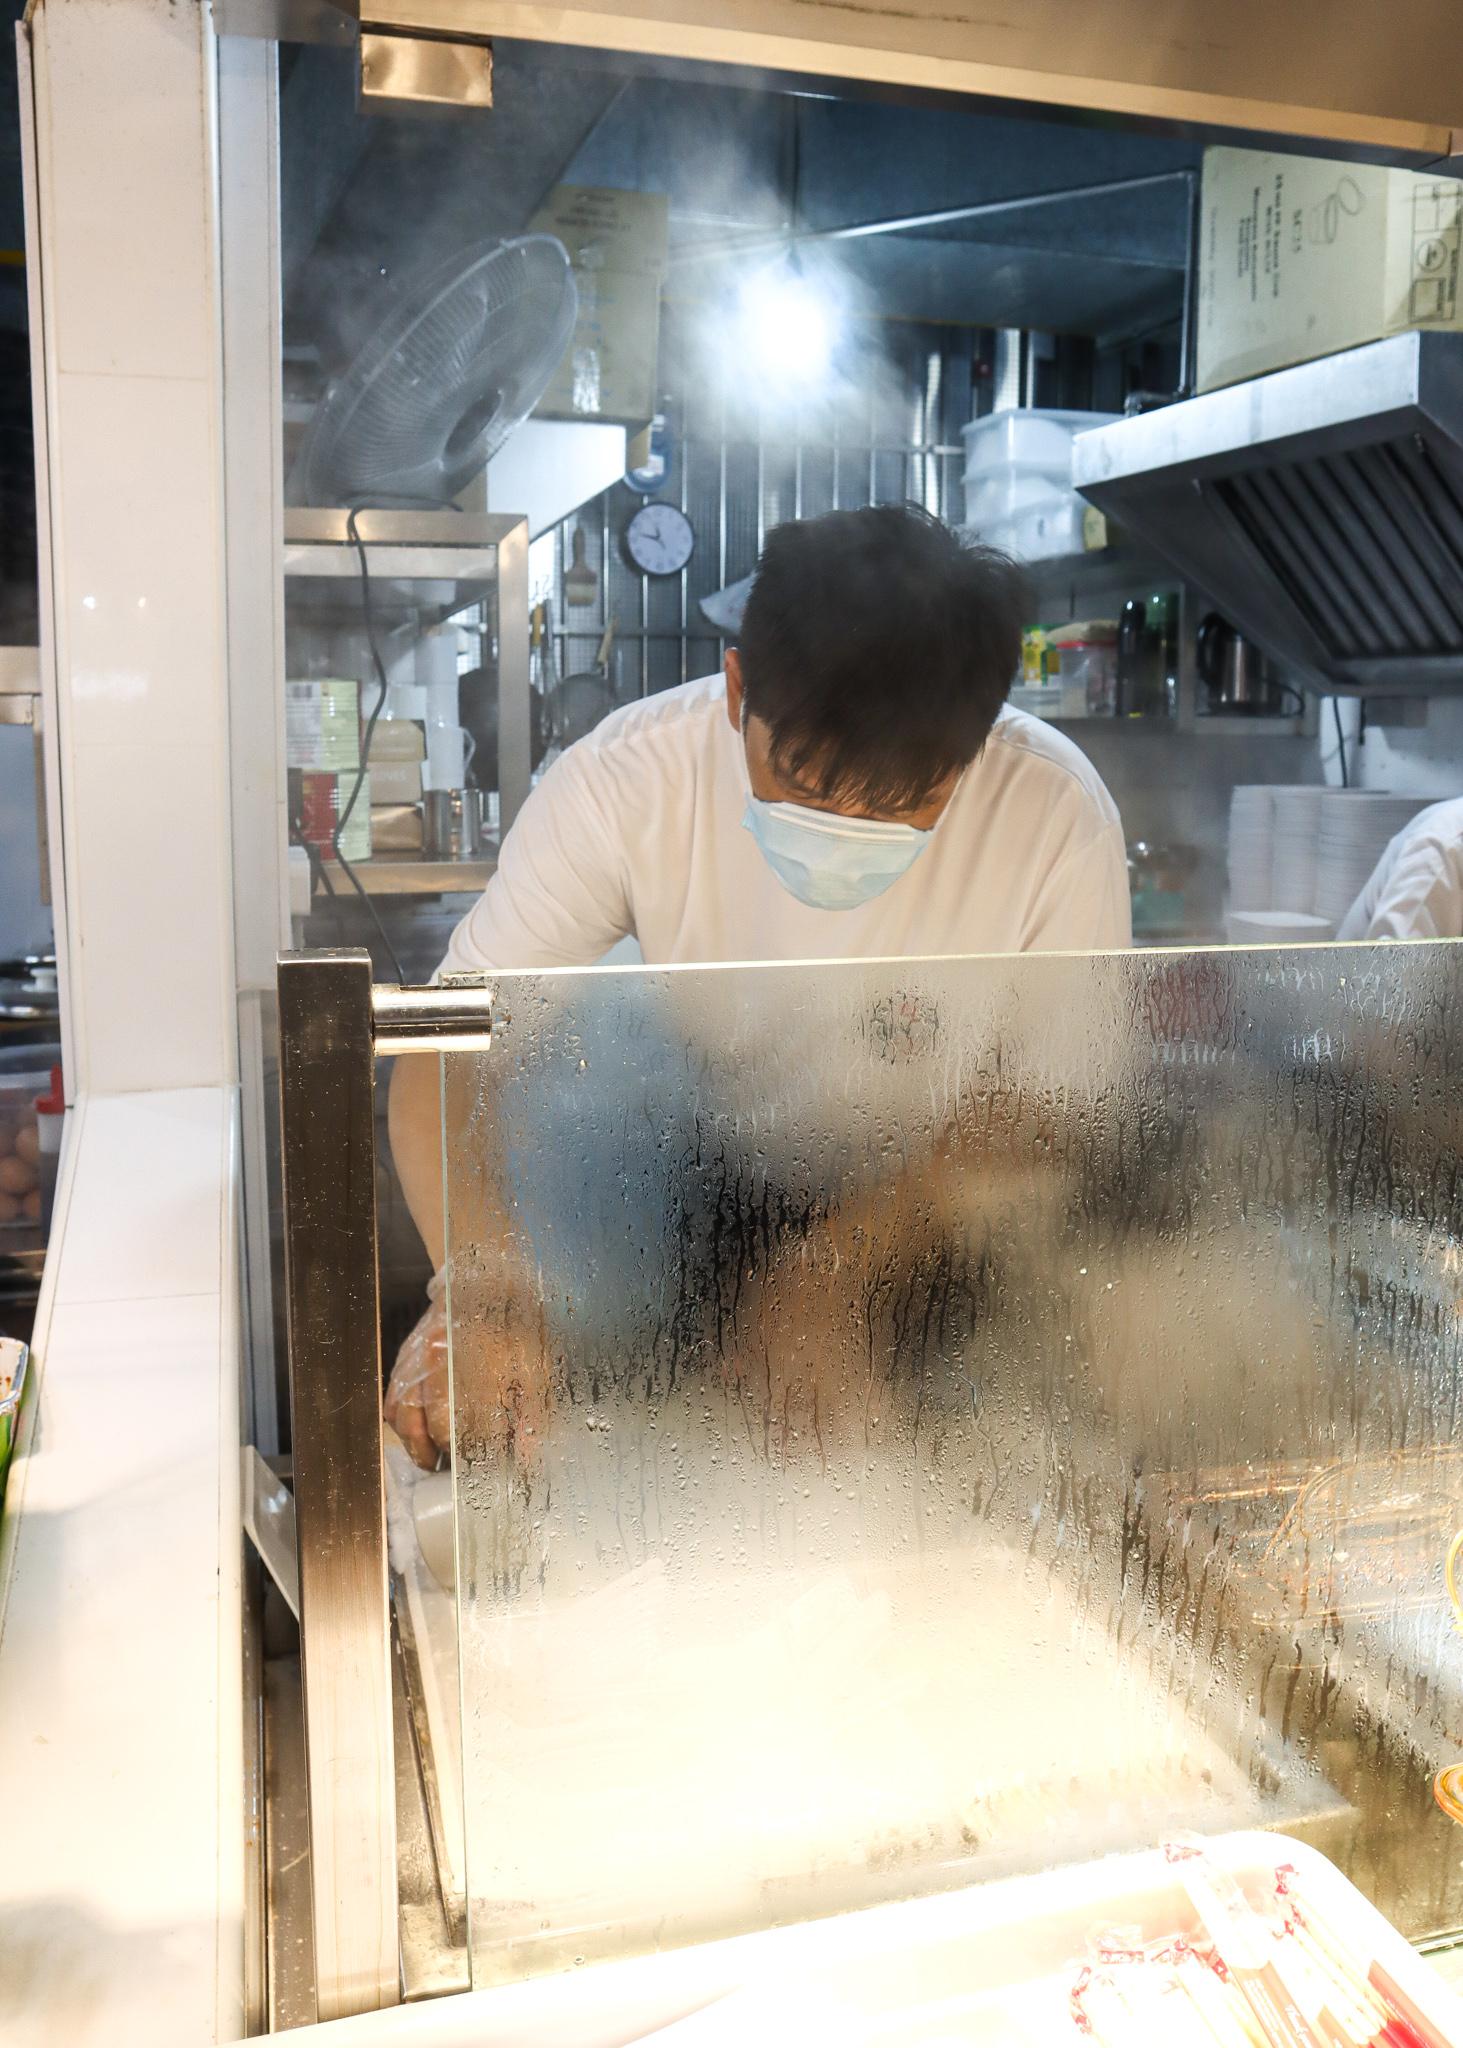 chefweihkcheecheongfun-05